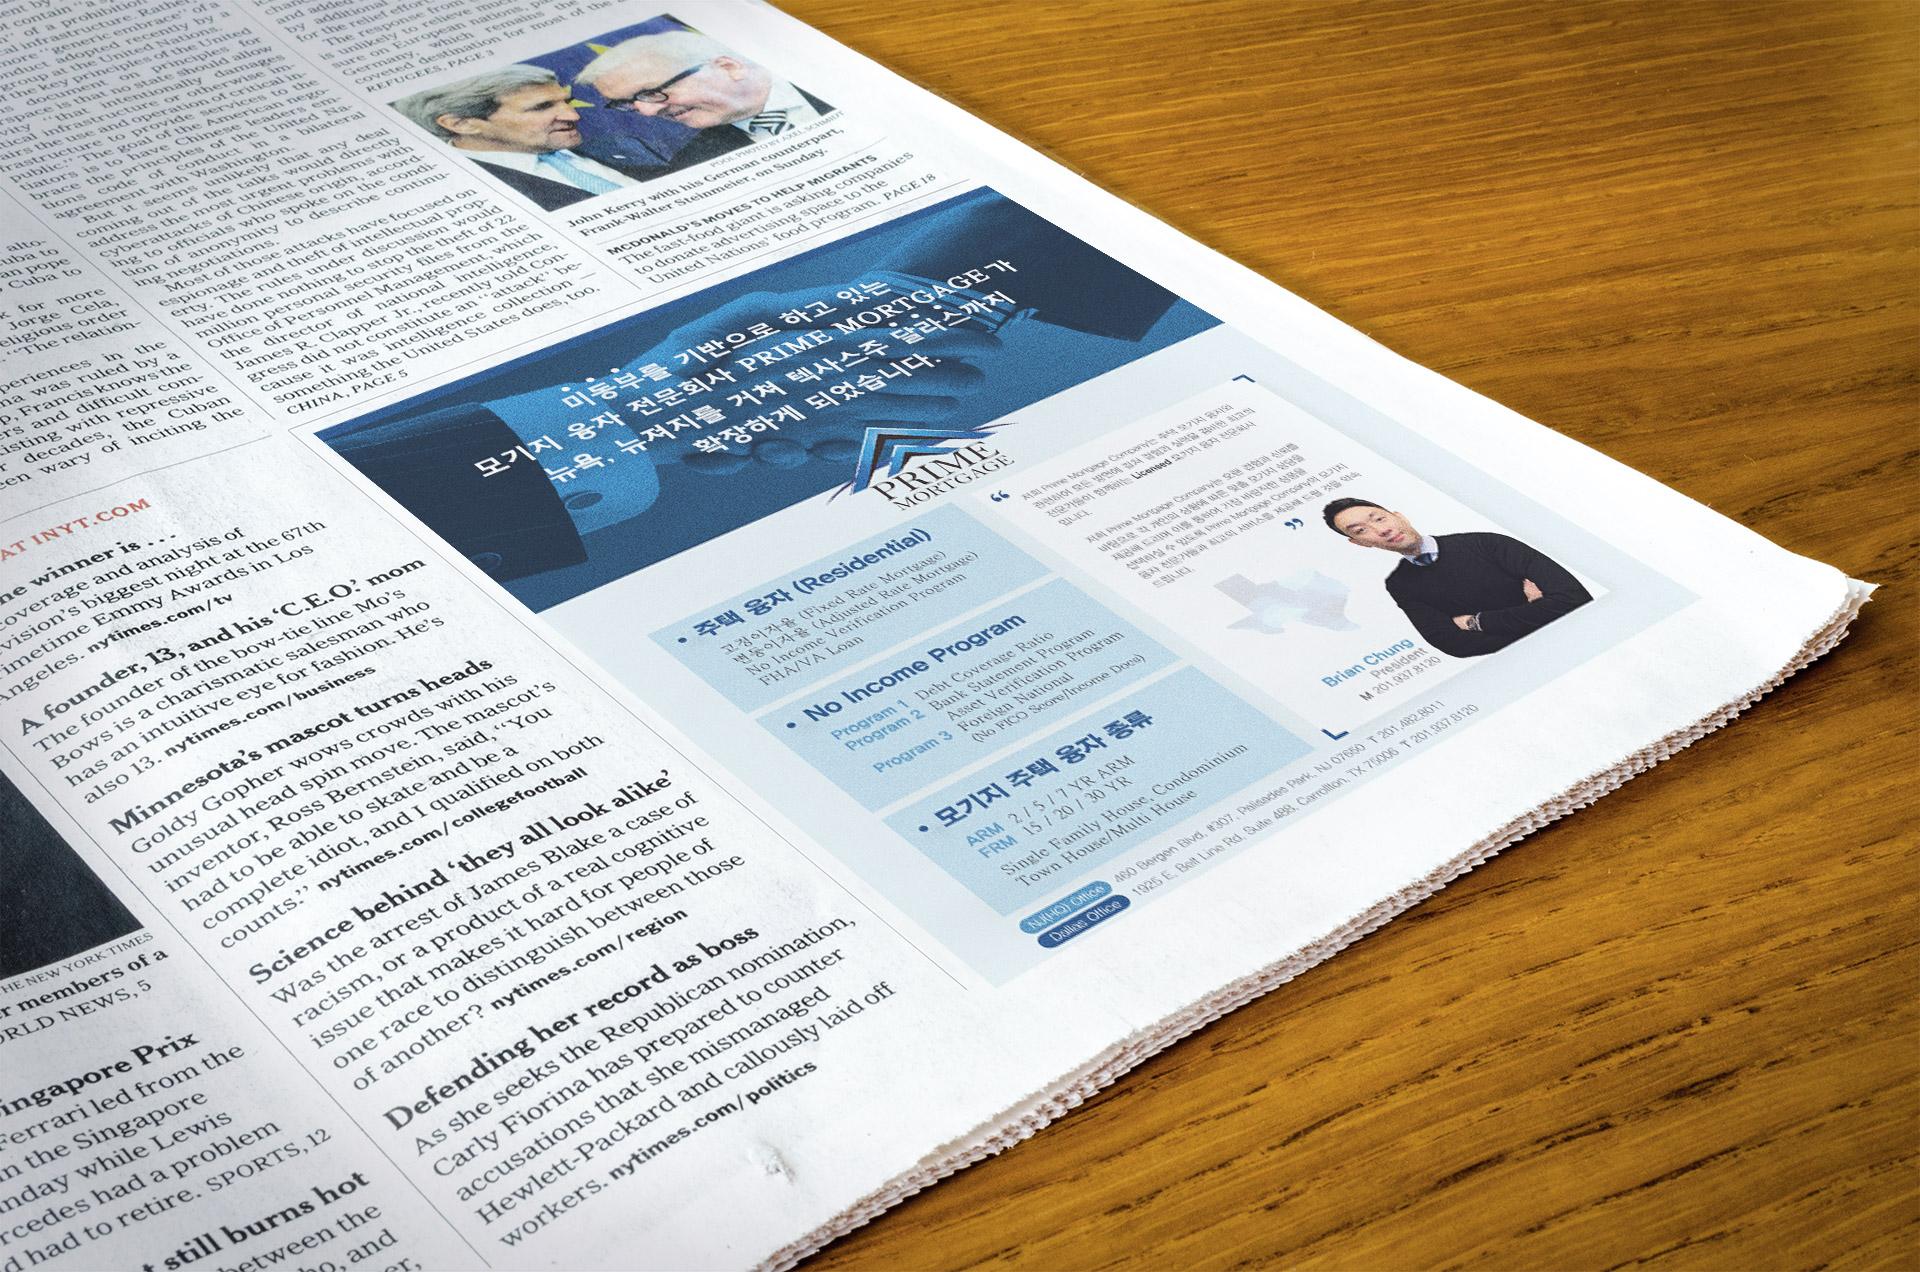 graphaddikt-com-free-newspaper-advert-mock-up-72-dpi.jpg